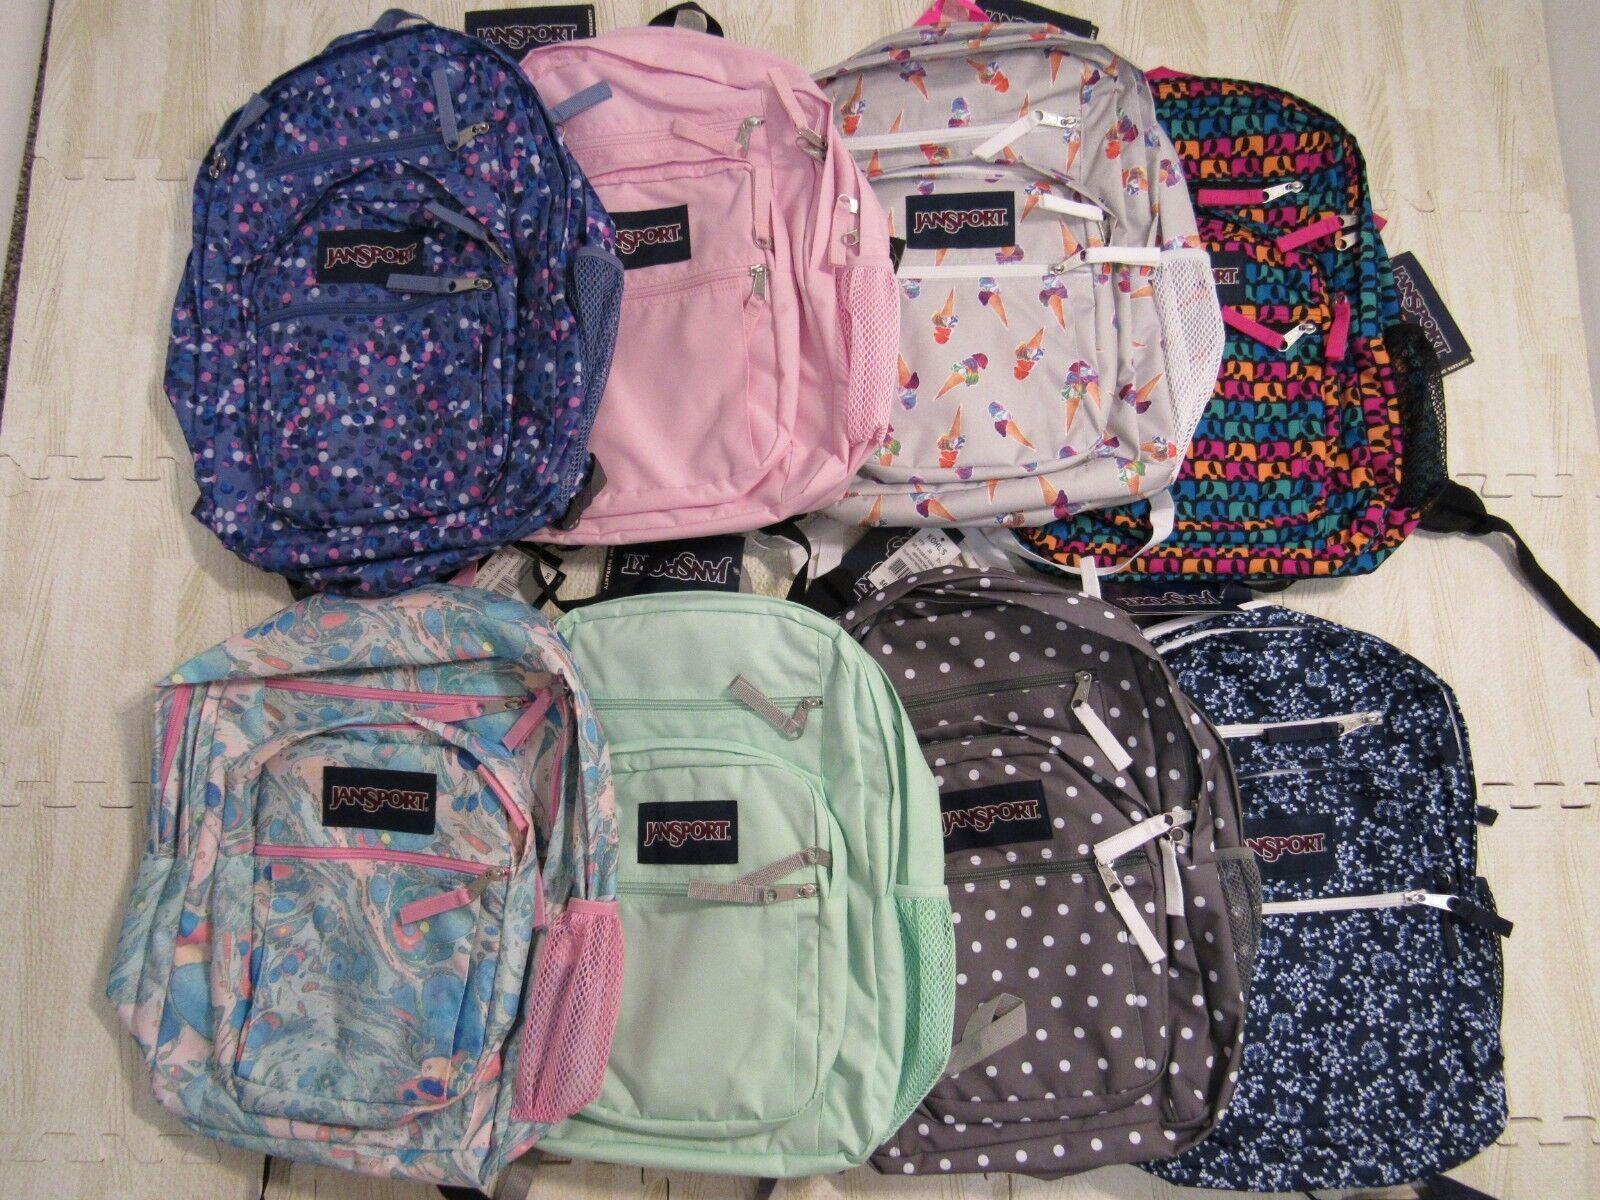 Jansport Big Student Backpack School Book Bag Nwt